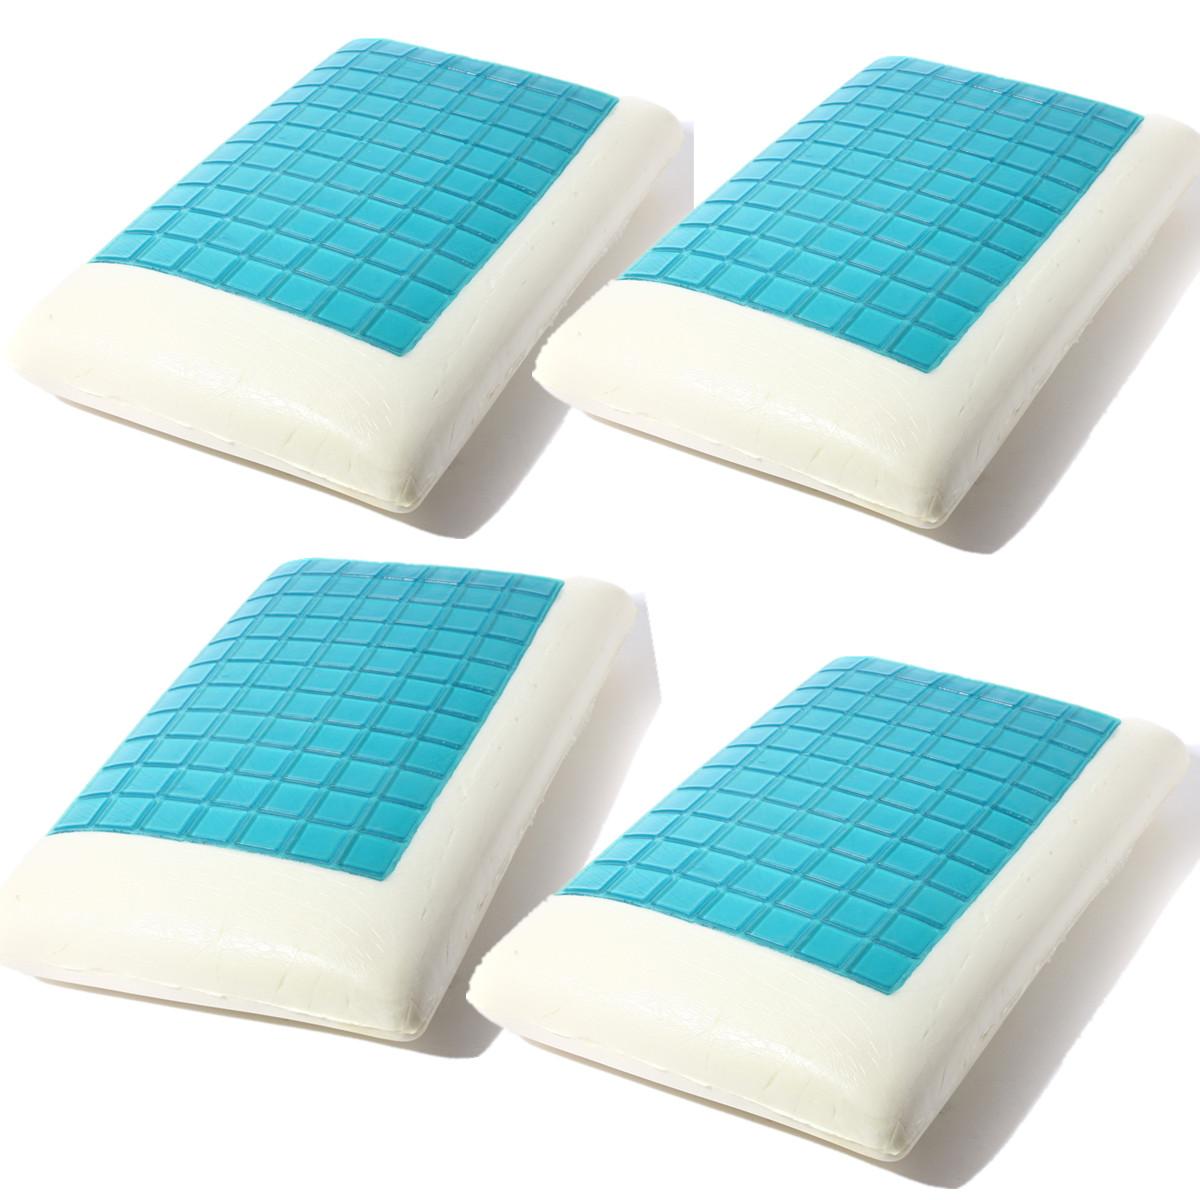 100 coolmax mattress pad a cool memory foam mattress topper